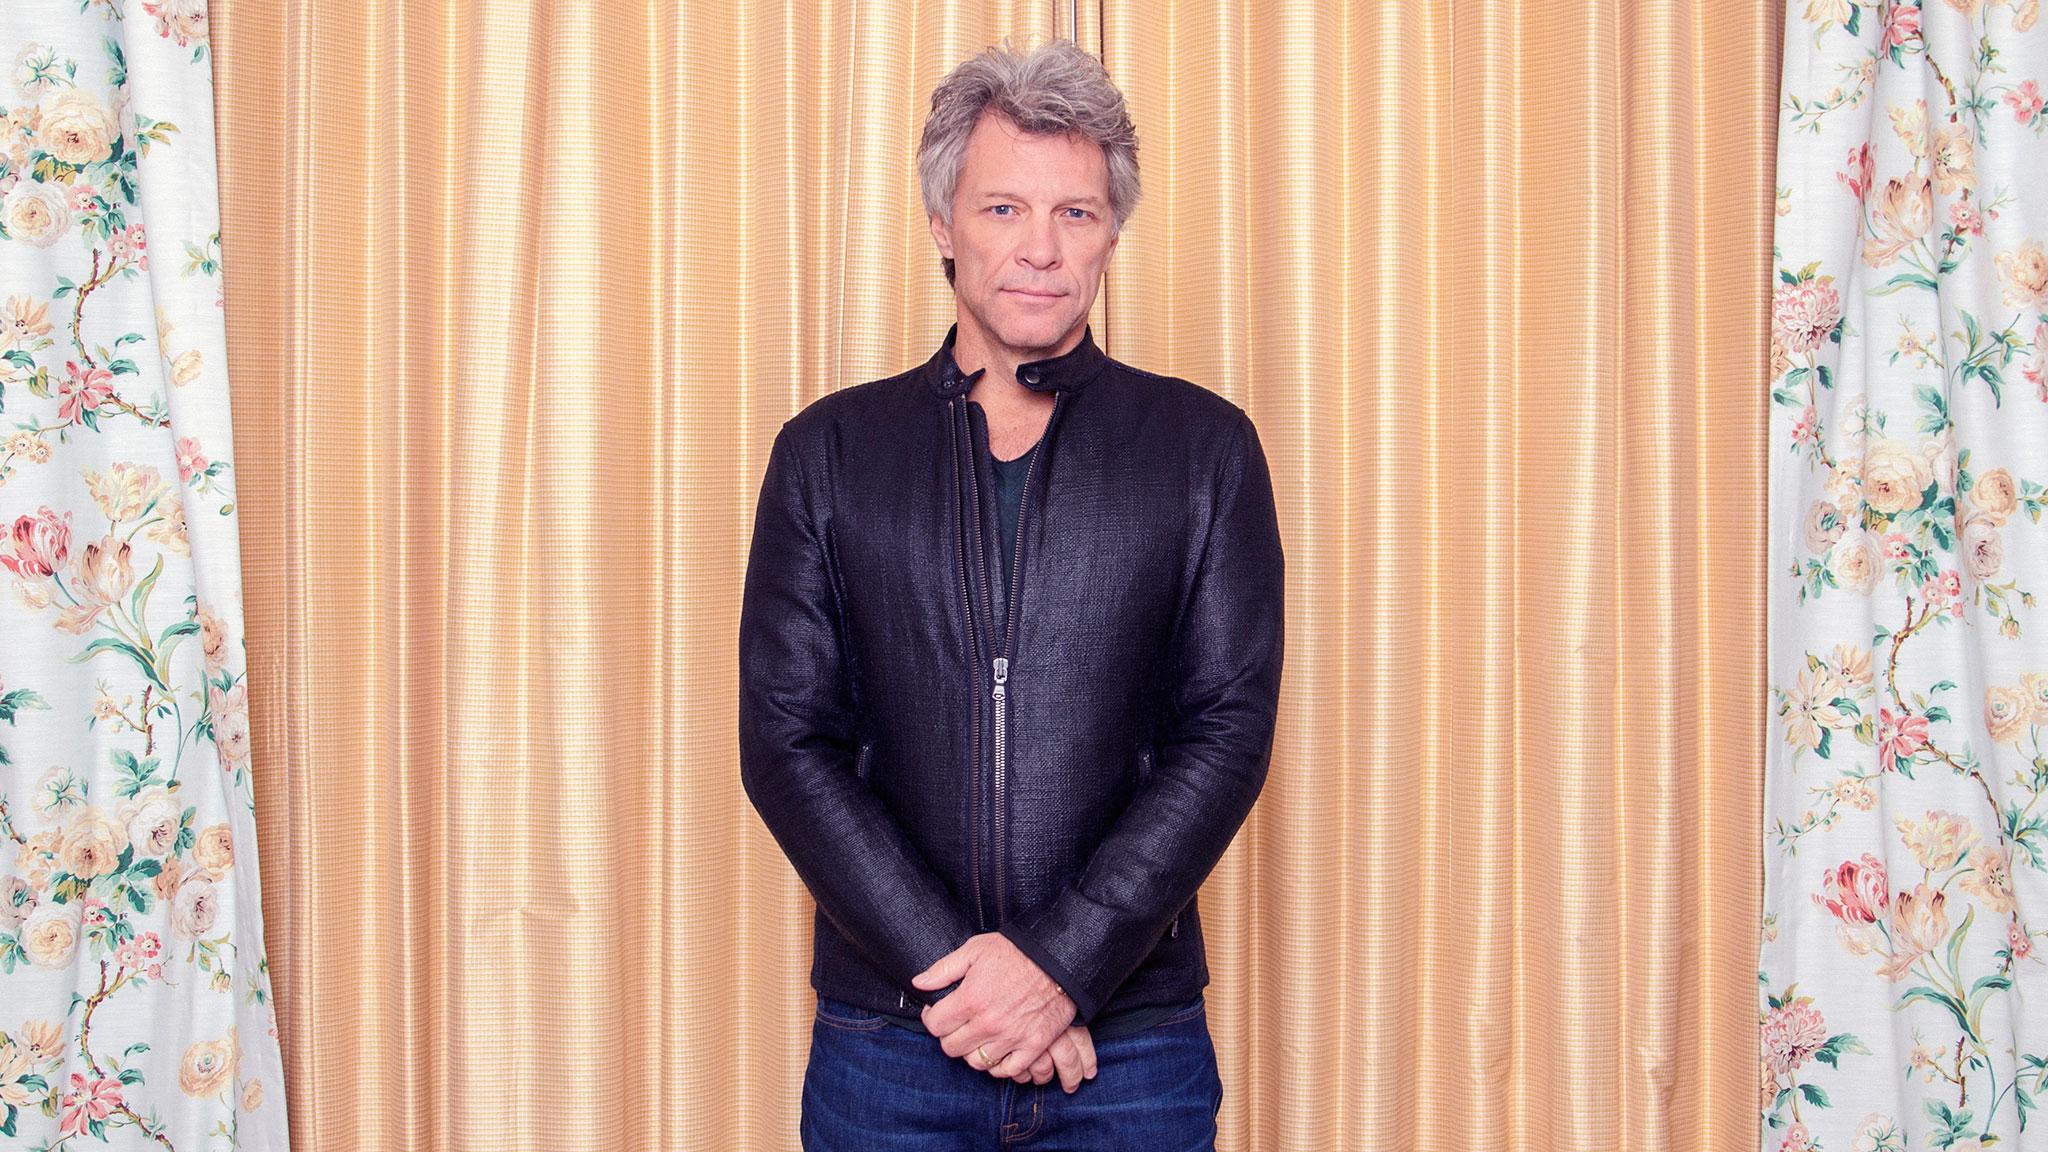 Jon Bon Jovi on hard work, losing his wingman and US